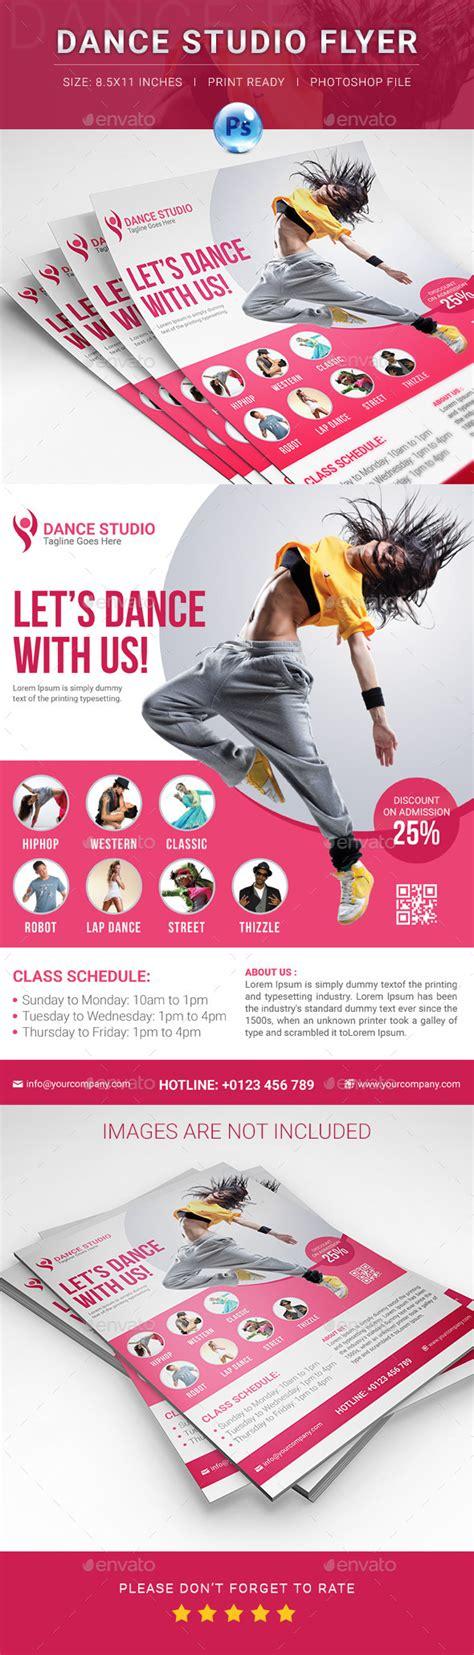 templates for dance flyers dance studio flyer by elite designer graphicriver